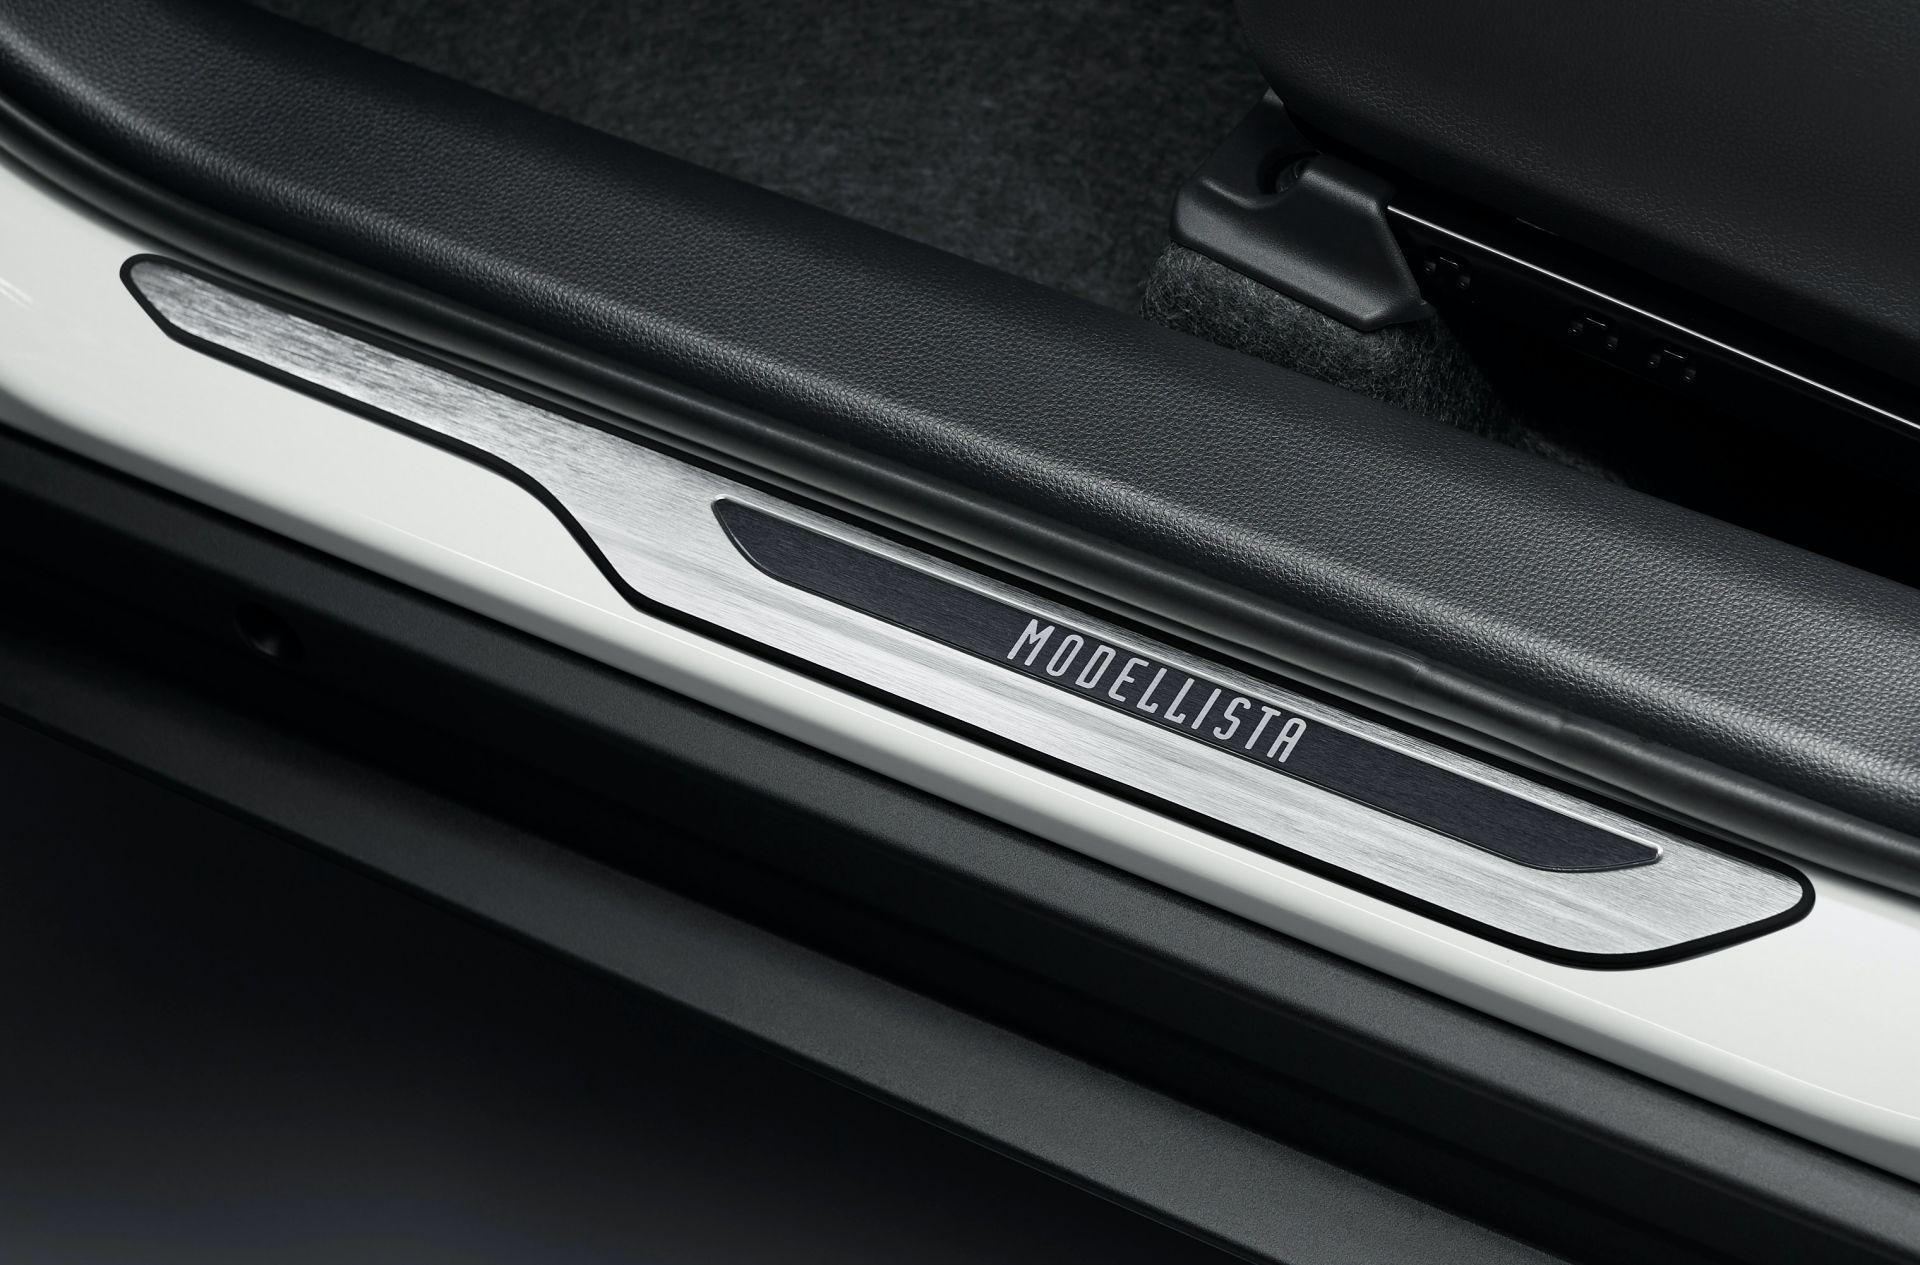 Toyota-Yaris-Cross-Gazoo-Racing-Modellista-parts-21